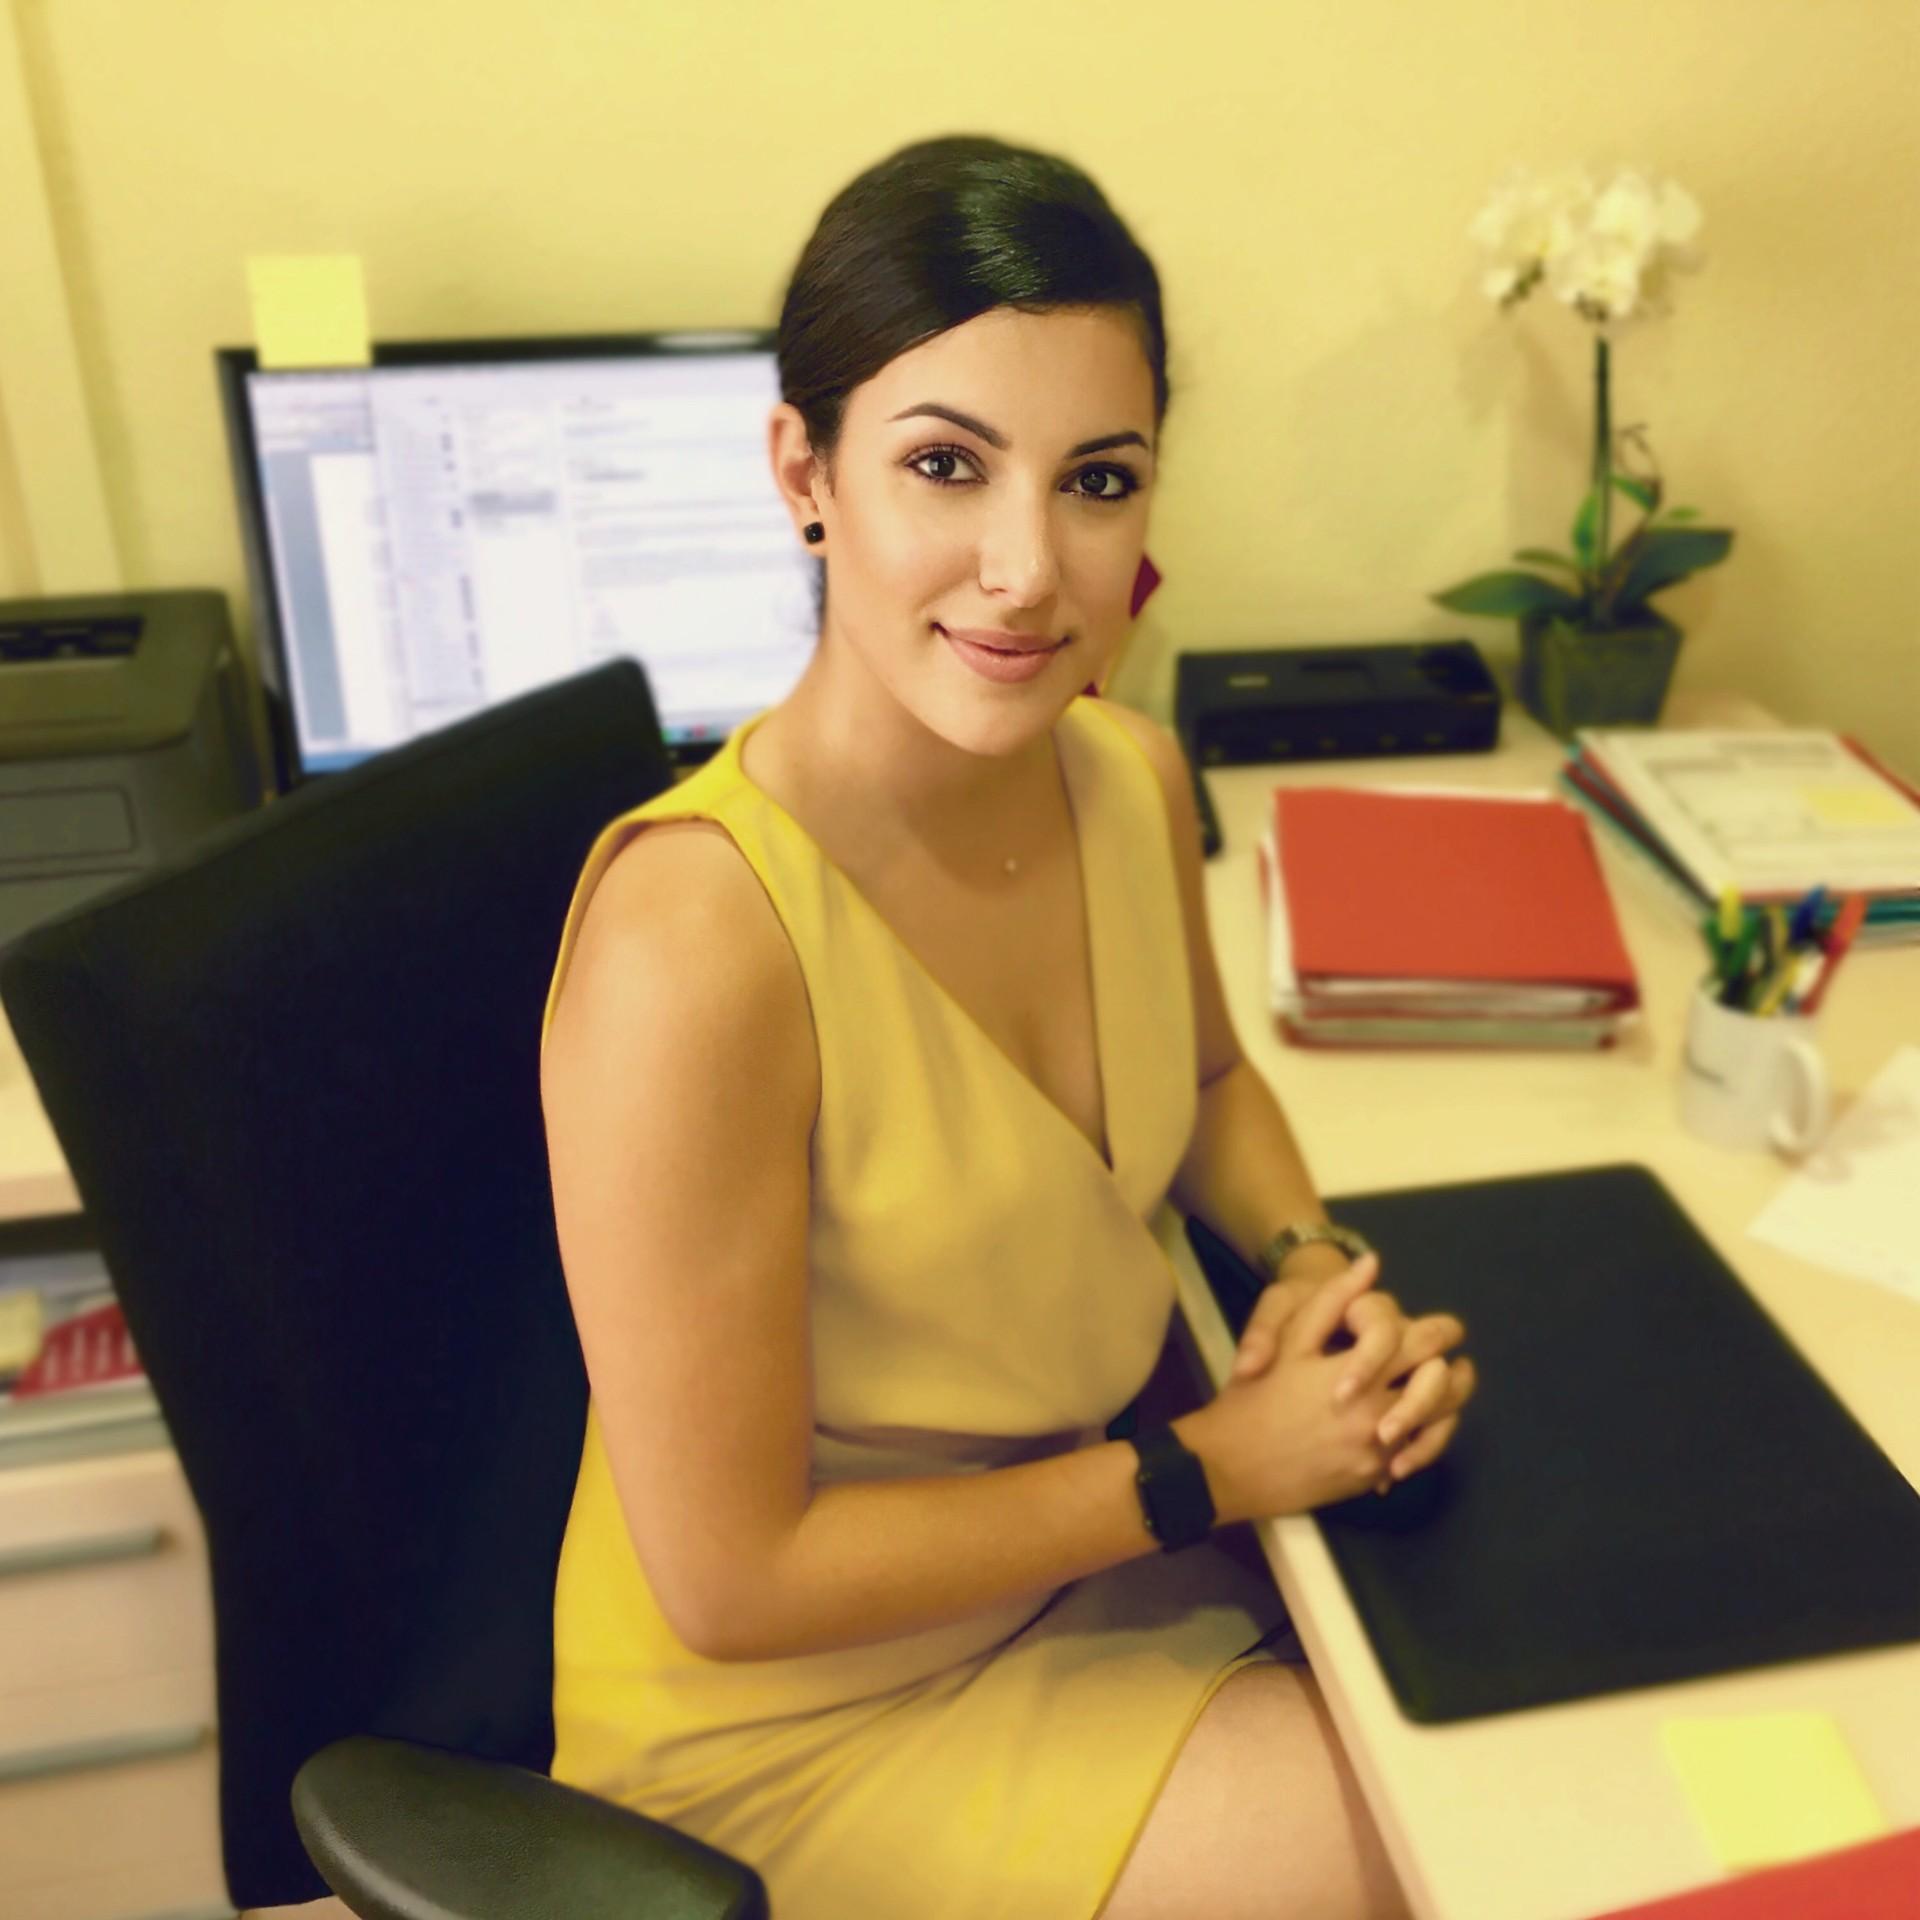 Olga Higalgo Artero